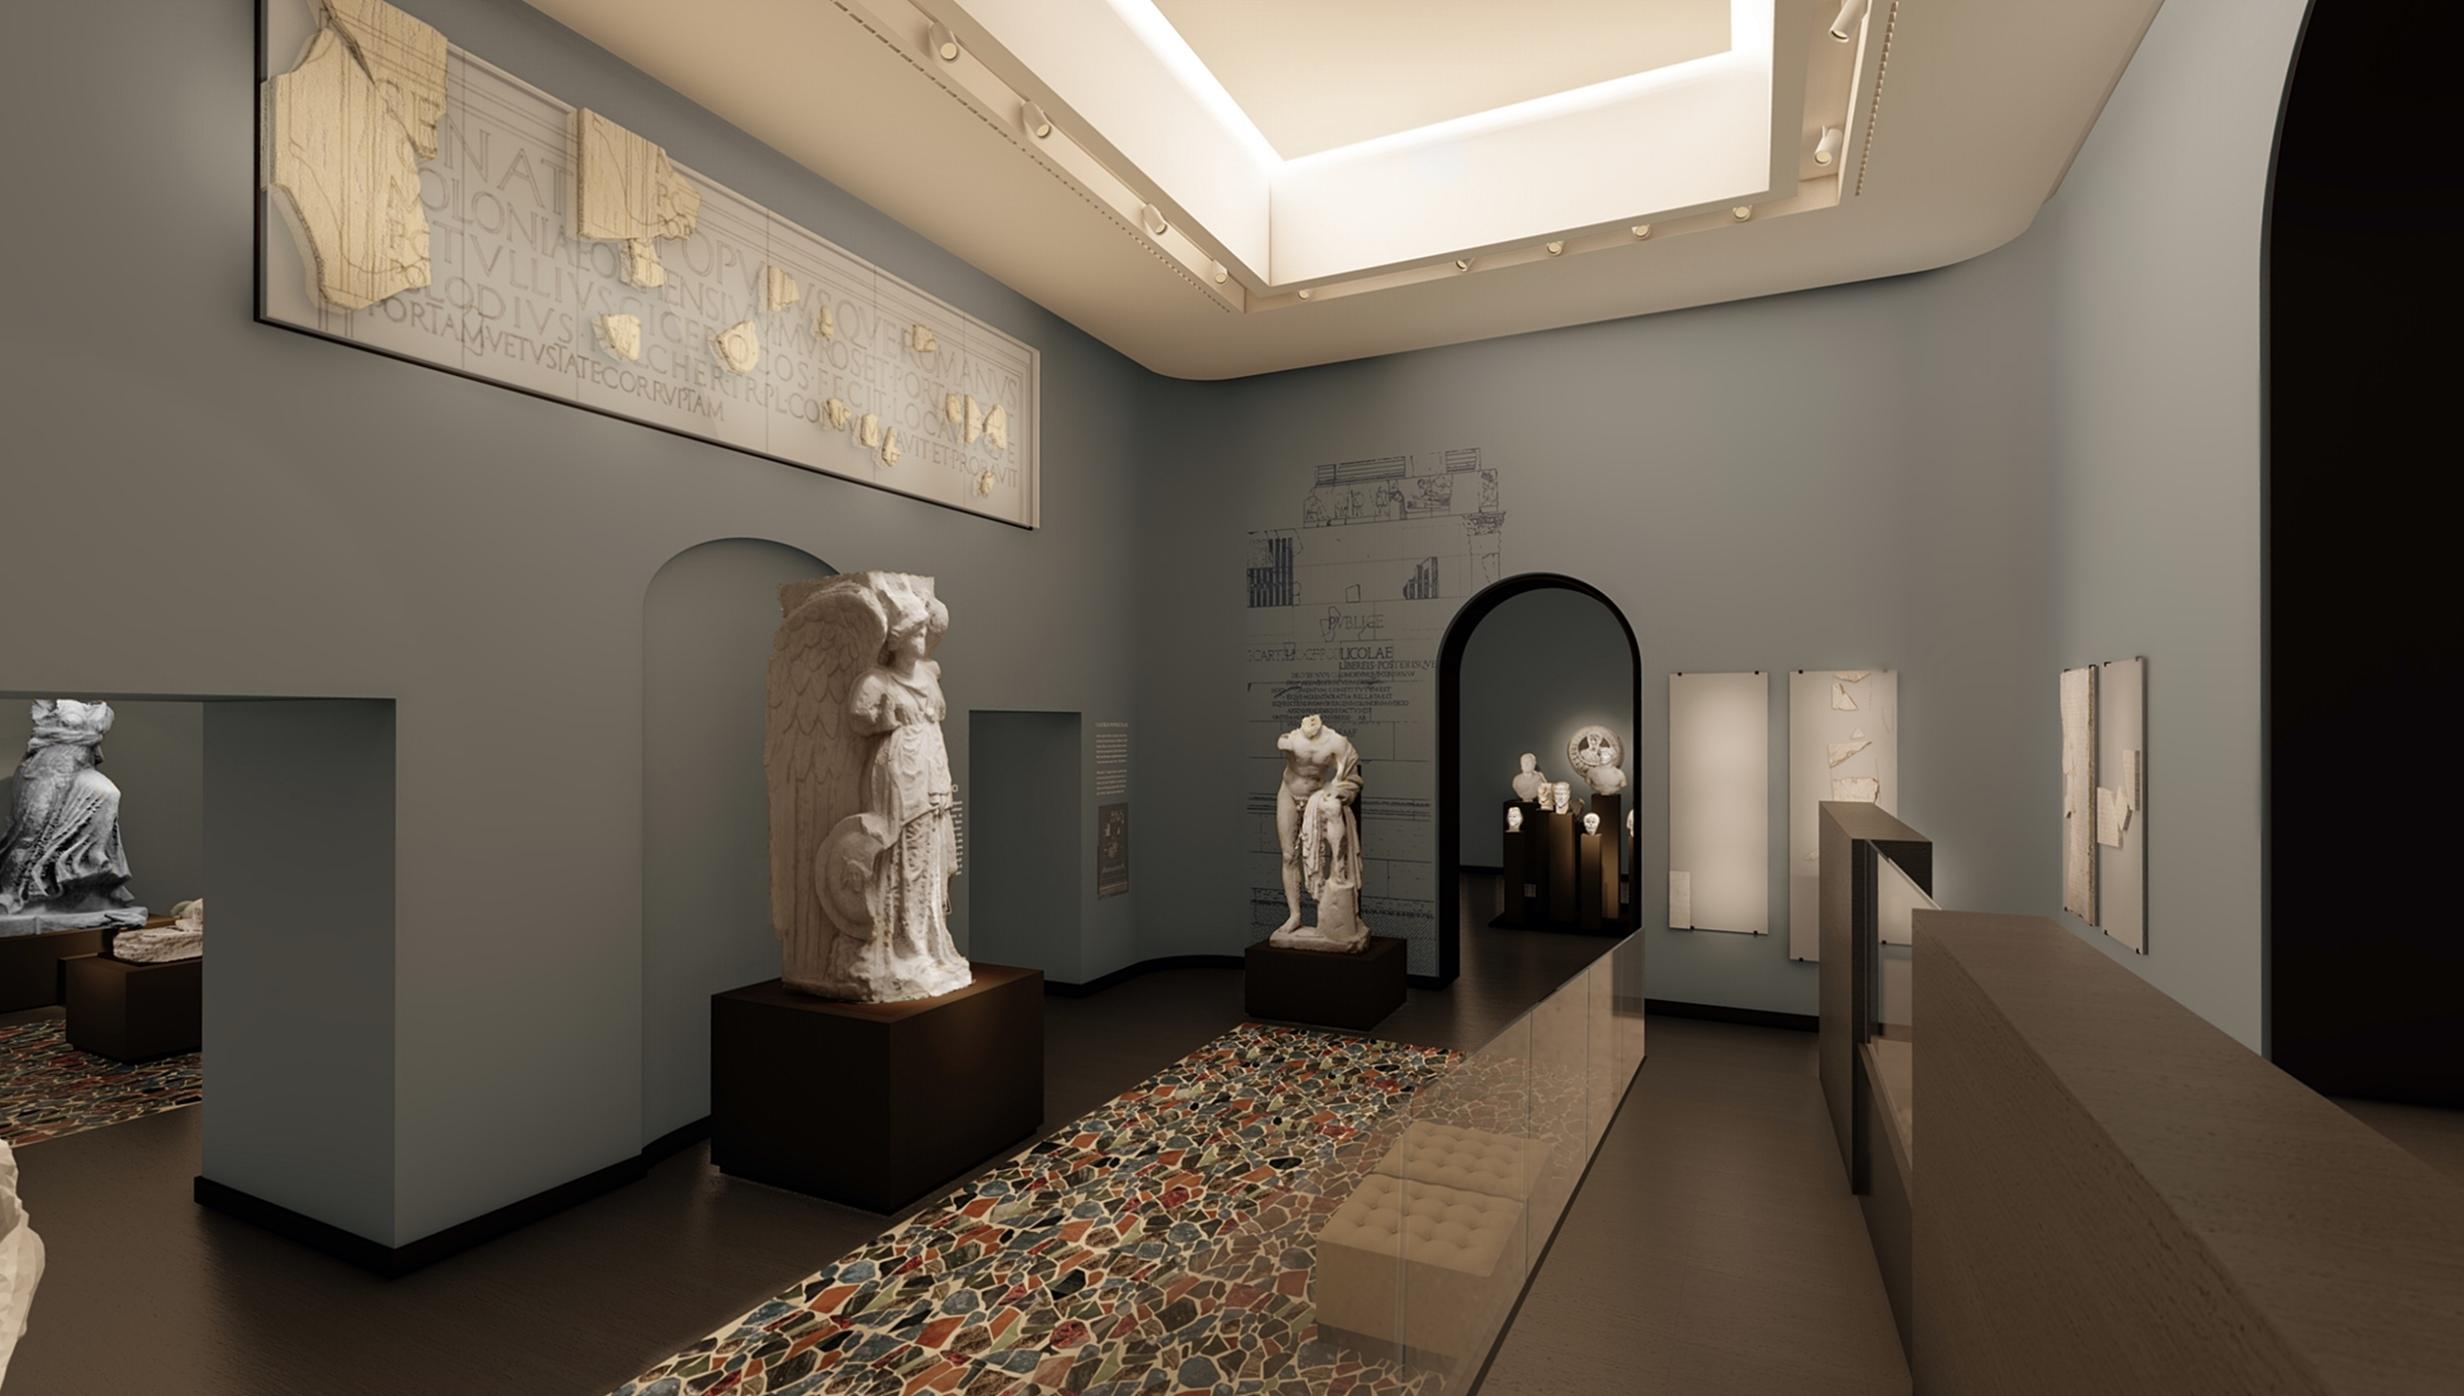 B+S_Museo_Ostiense (2)